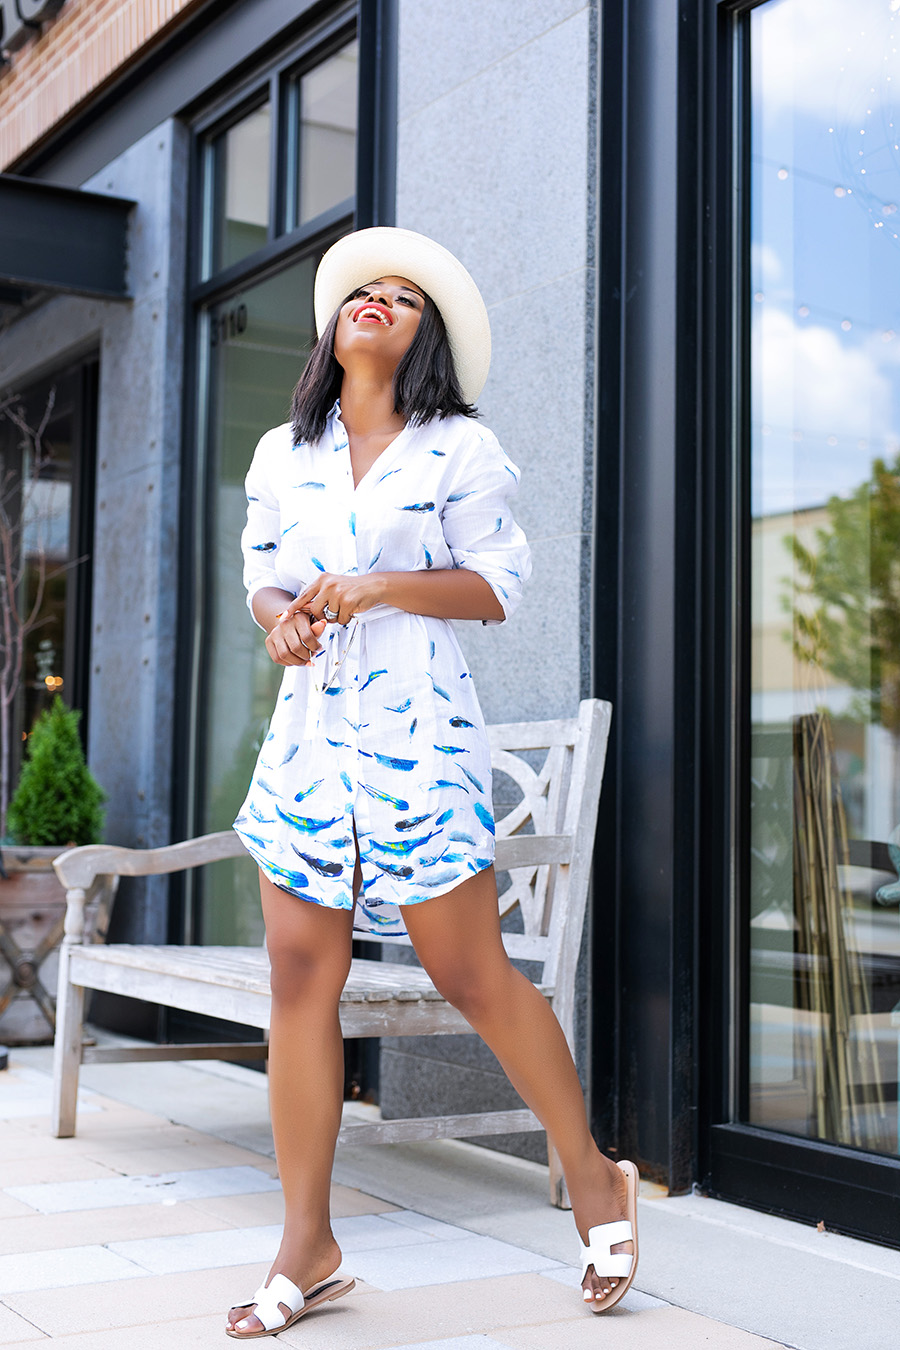 Vilebrequin dress shirt and straw hat, summer vacation, www.jadore-fashion.com